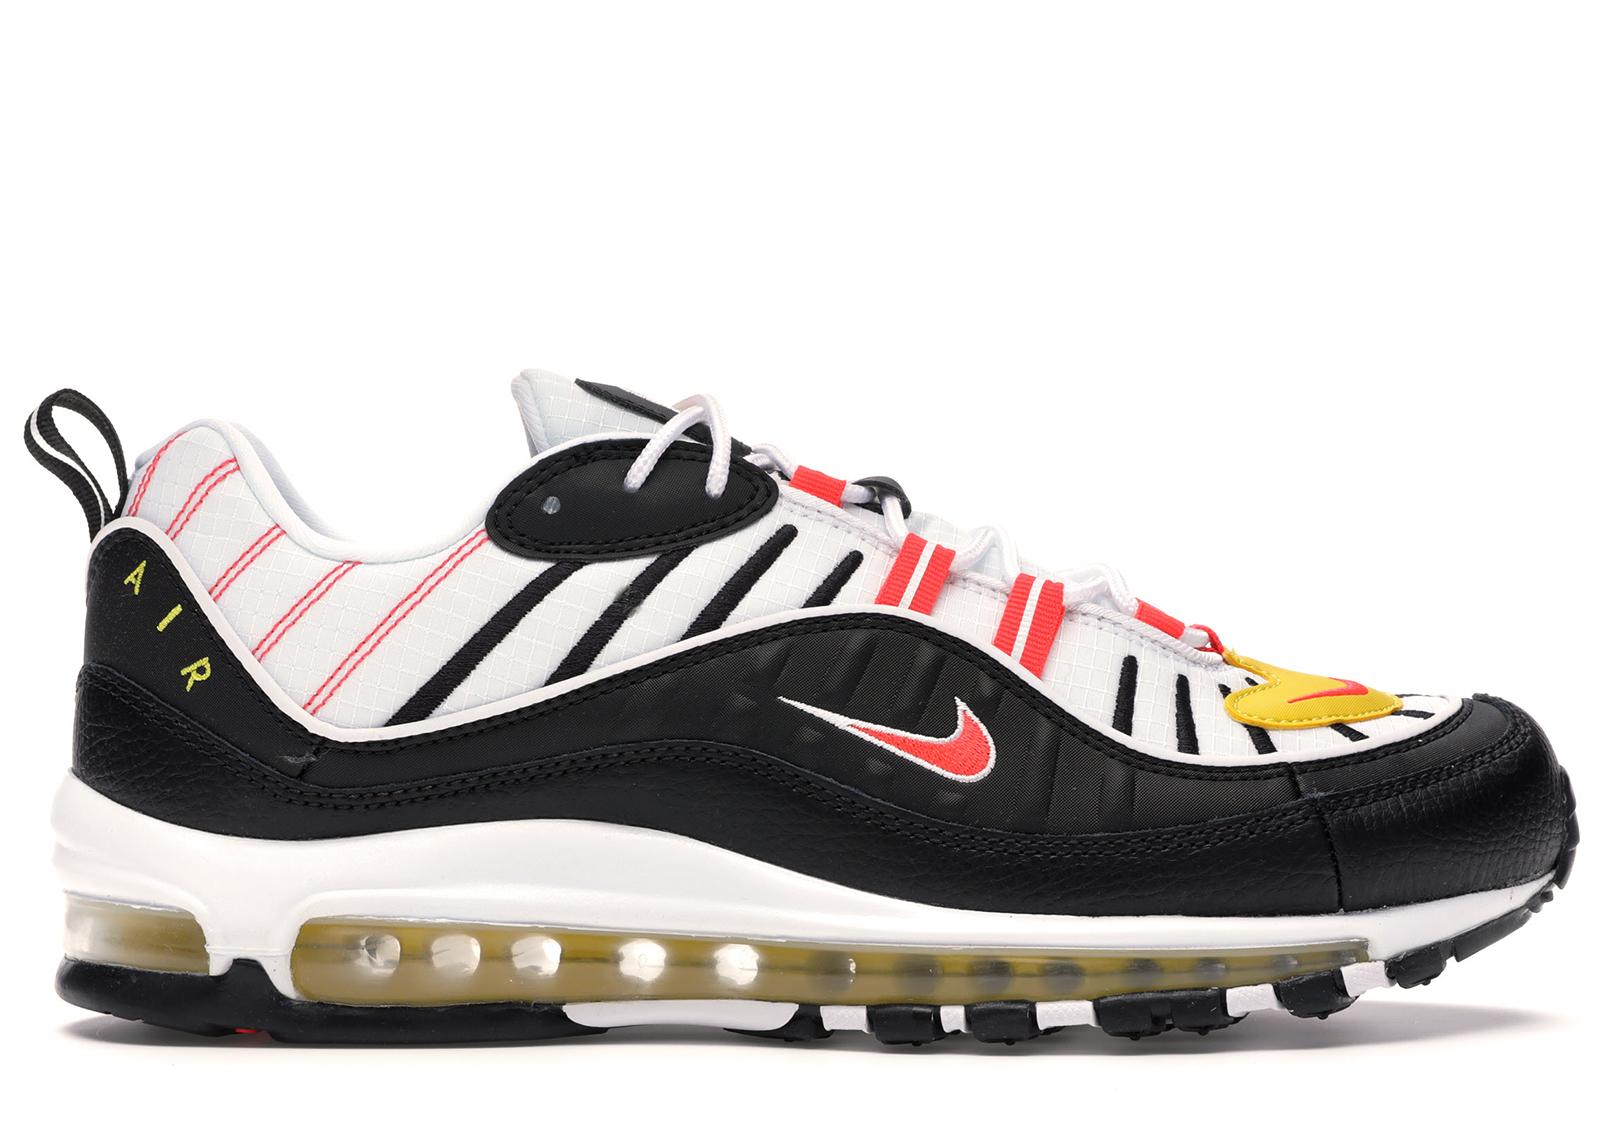 Nike Air Max 98 Black White Yellow